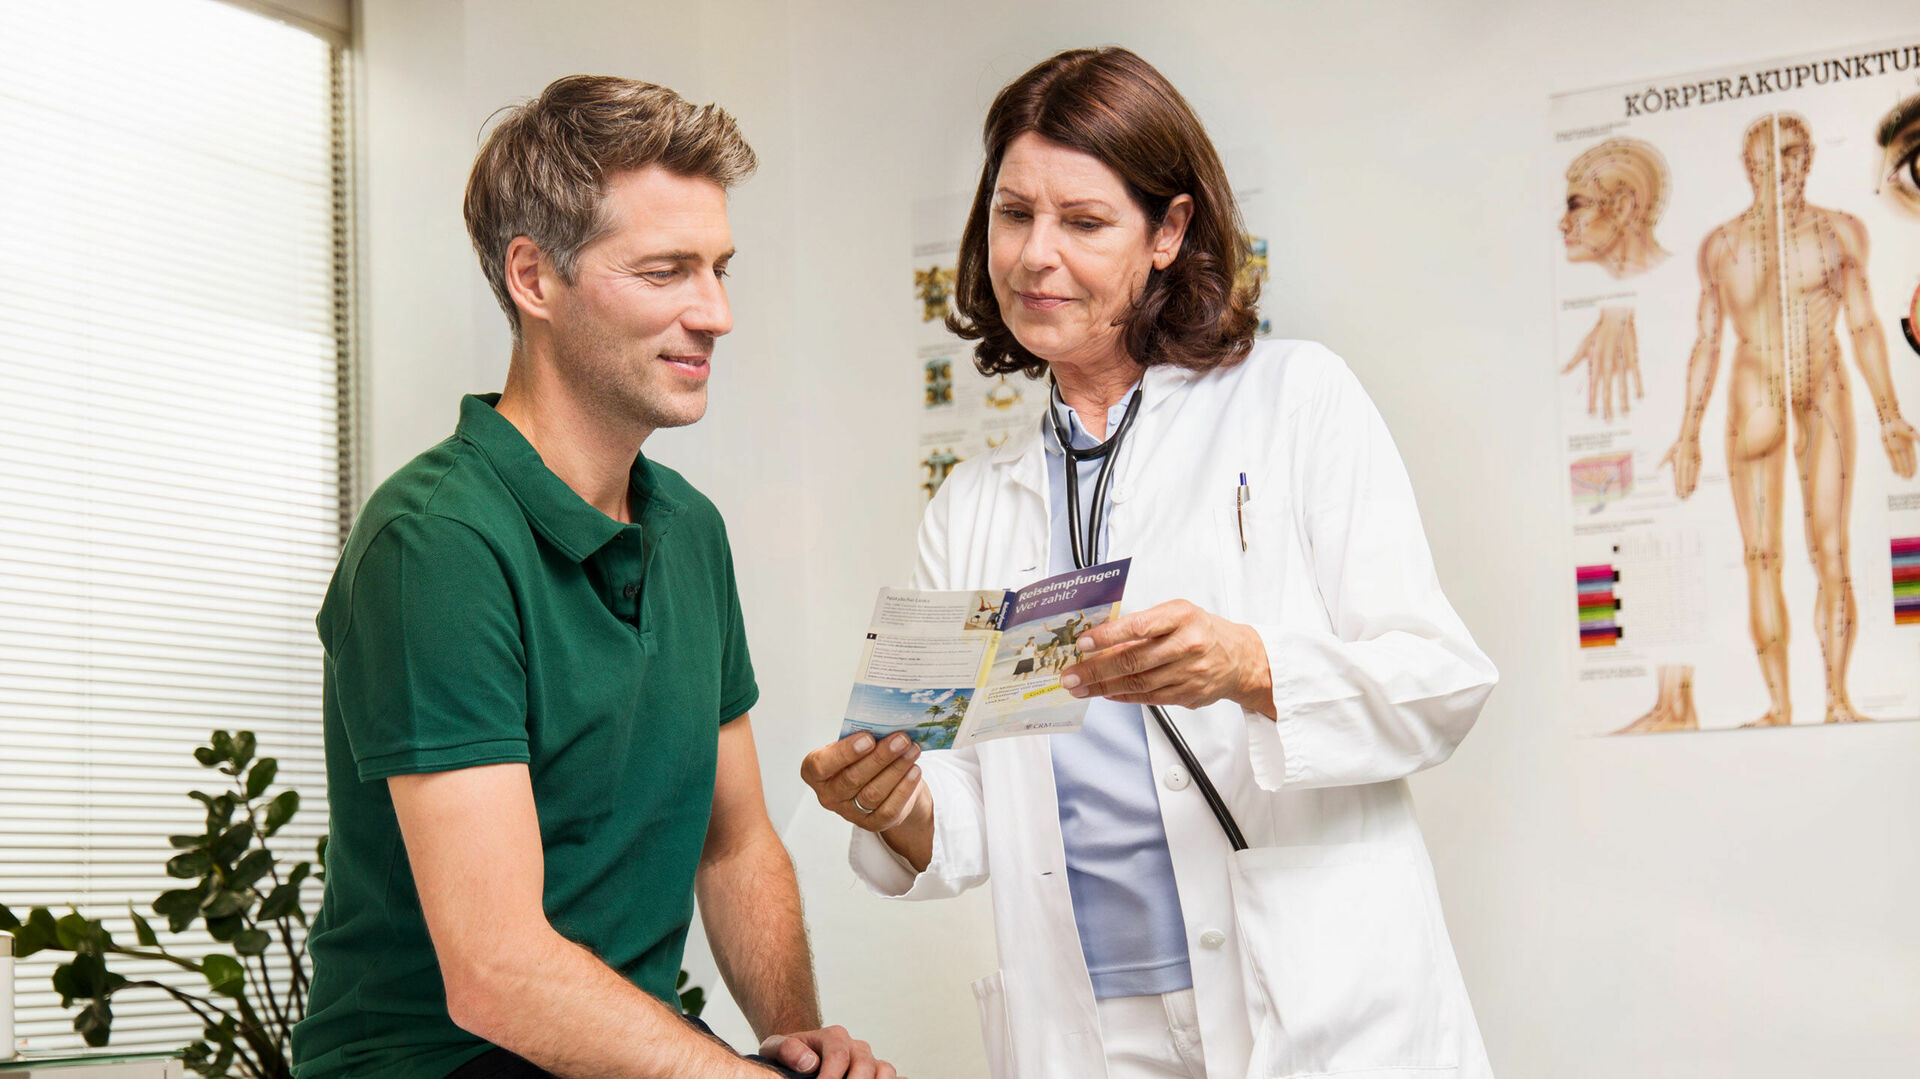 Pneumokokken Impfung Sbk